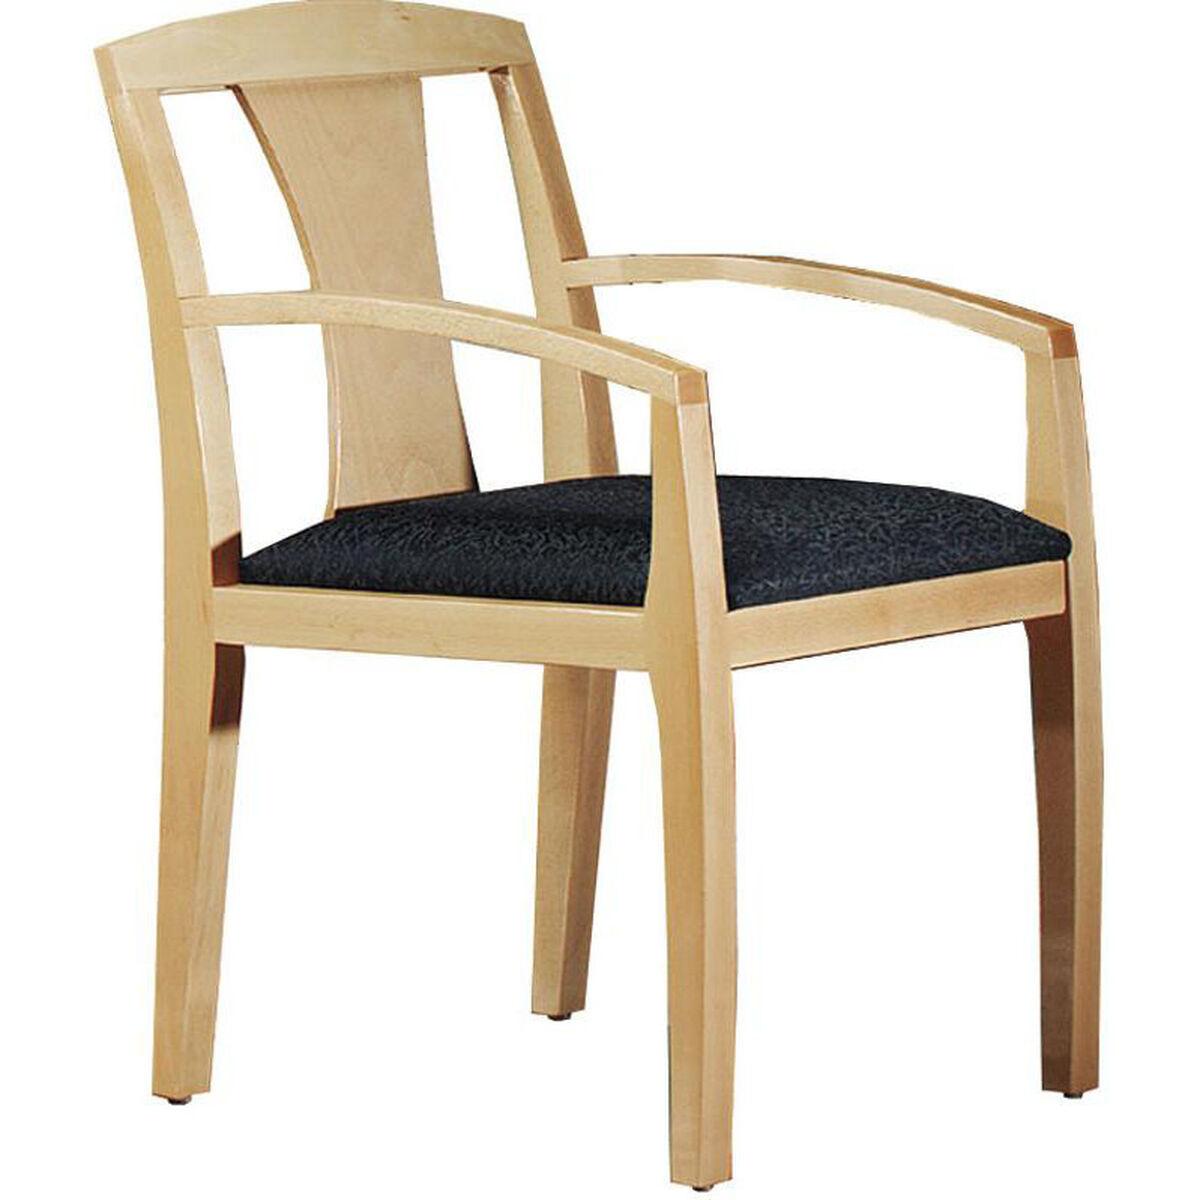 High Point Furniture Industries 9403 Hpf